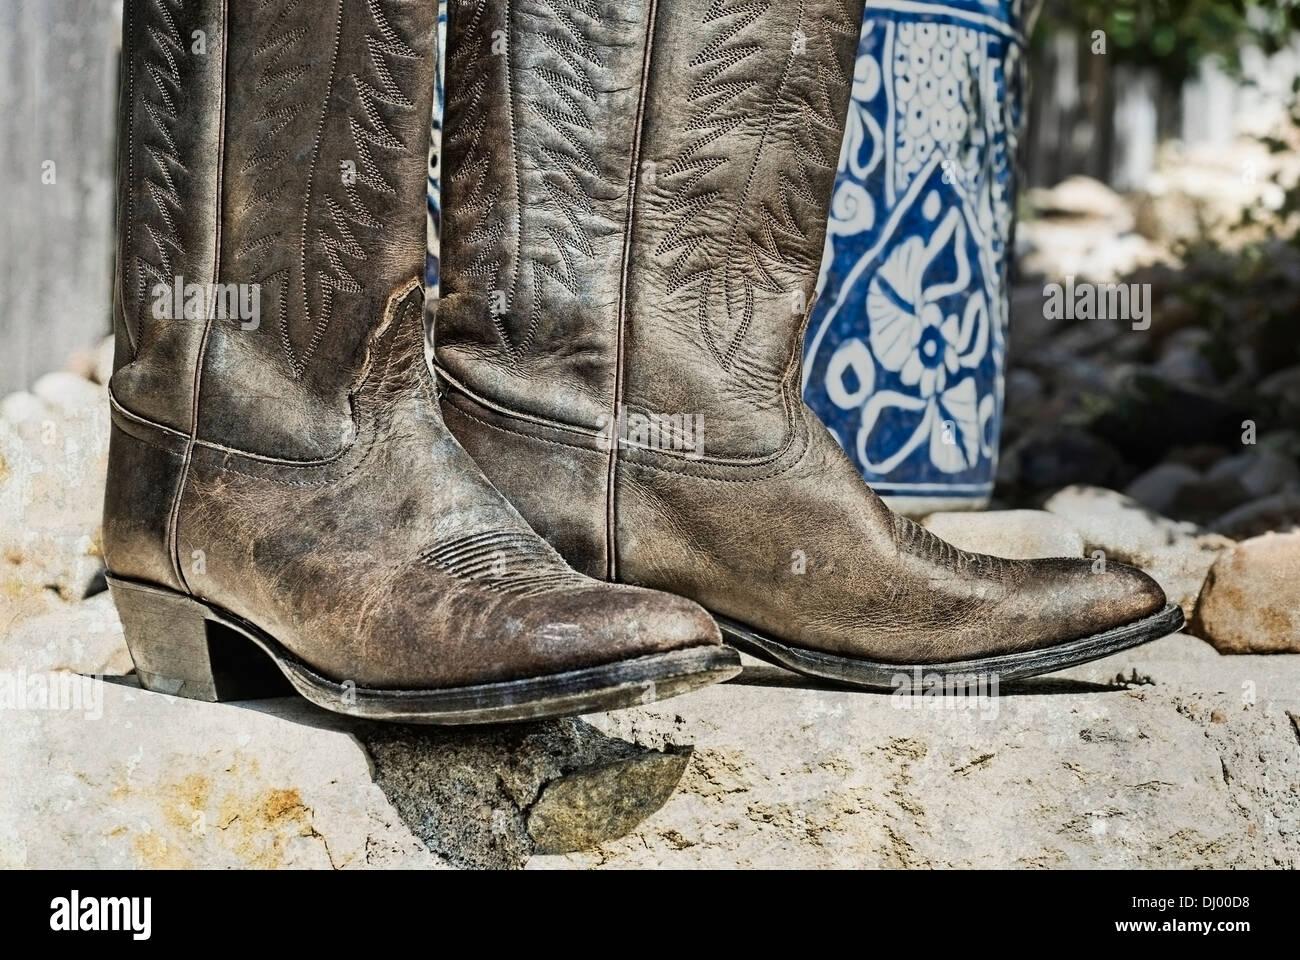 904332bc394 Weathered cowboy boots Stock Photo: 62695284 - Alamy